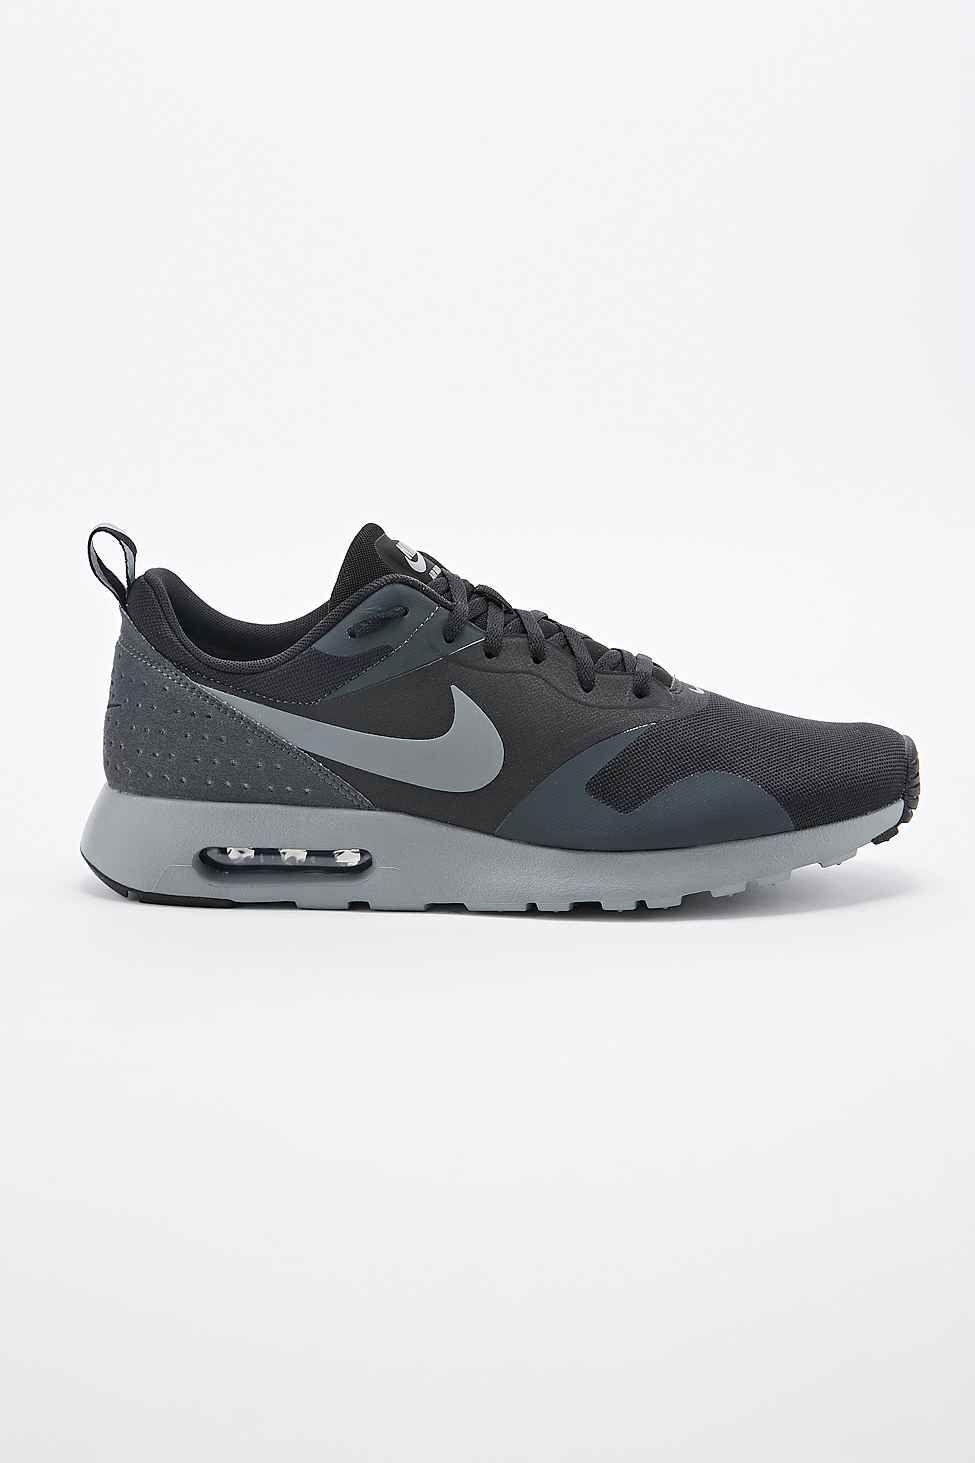 Nike Air Max Tavas Trainers in Black